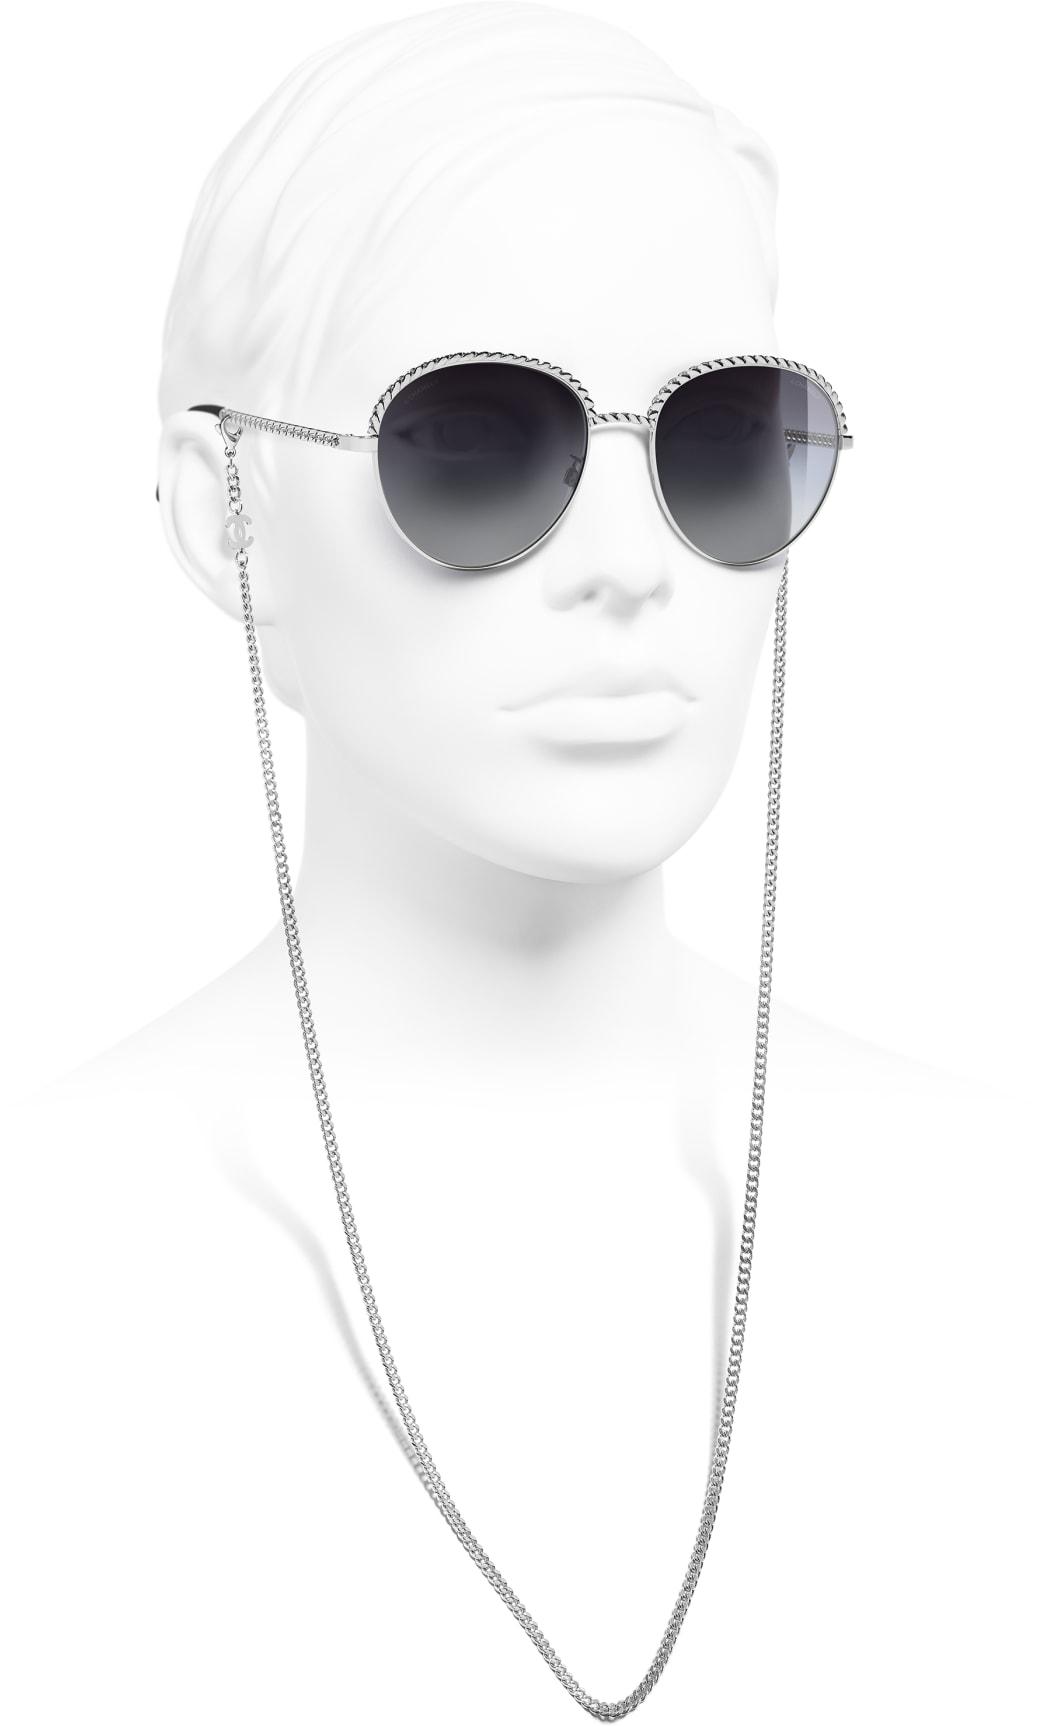 Occhiali modello pantos da sole